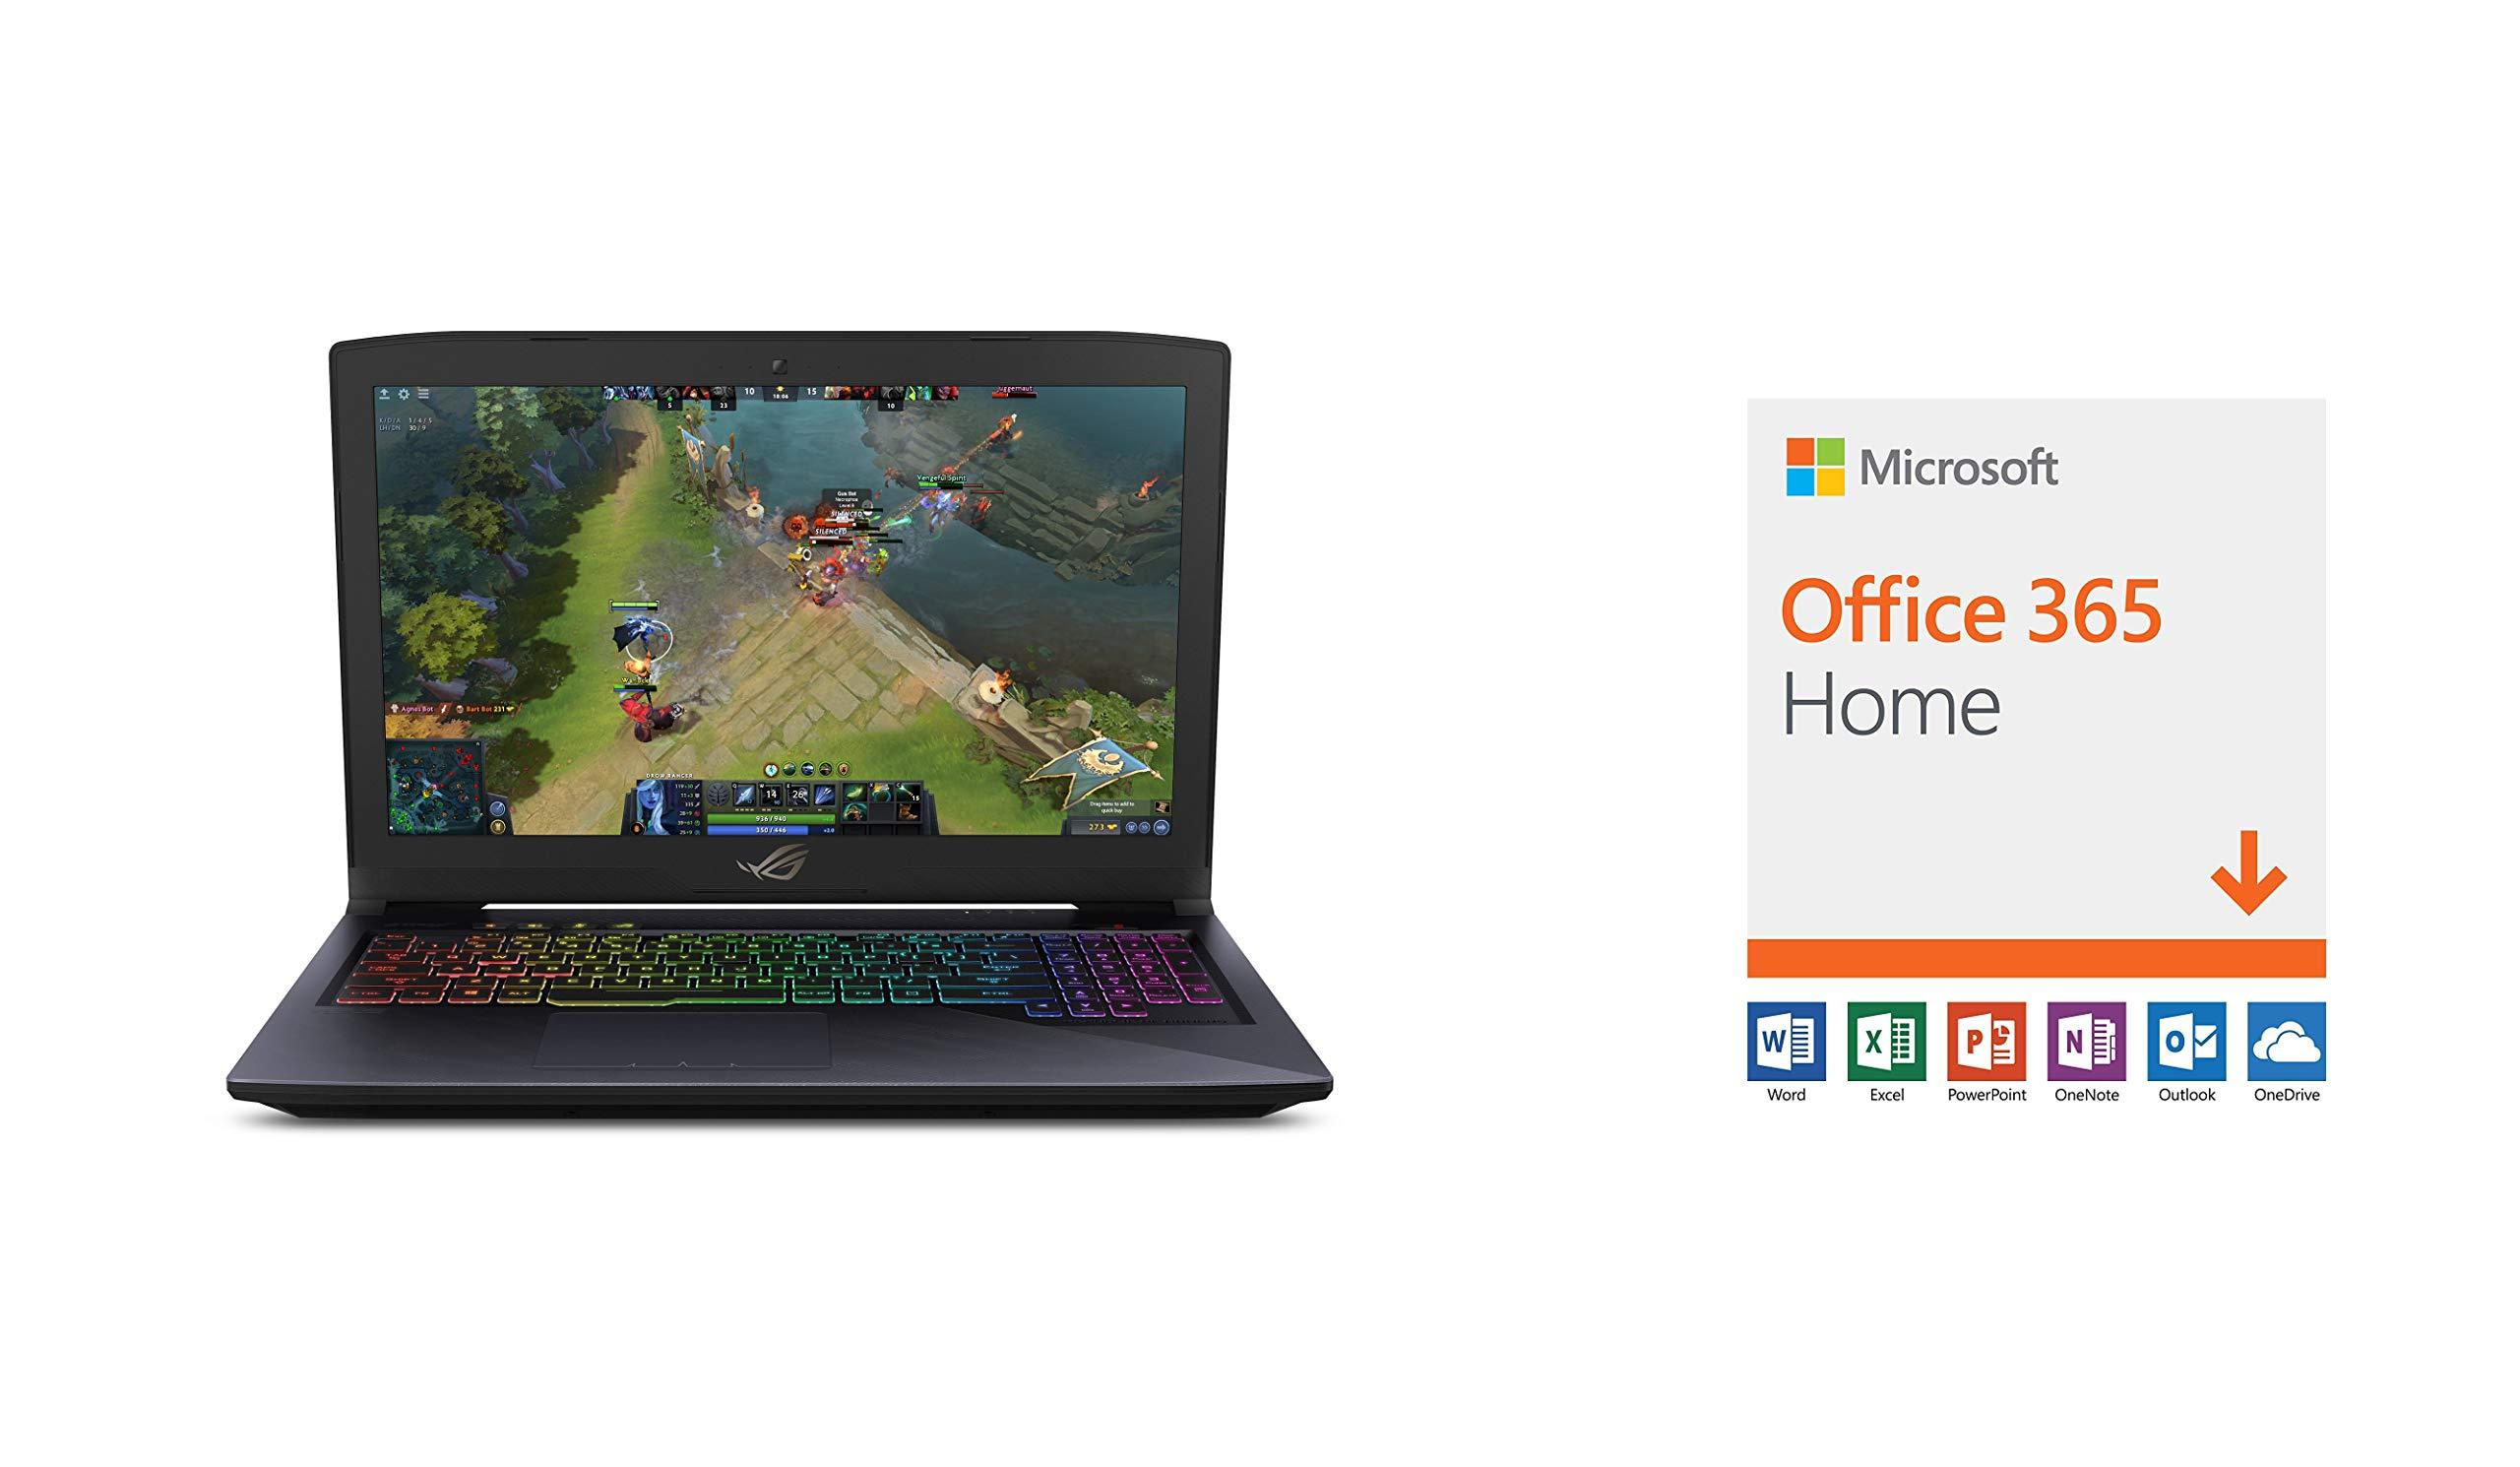 "ASUS ROG Strix Hero Edition Laptop (Windows 10 Home, Intel Core i7-8750H 3.9GHz, 15.6"" Screen, Storage: 1 TB, RAM: 16 GB) Black"